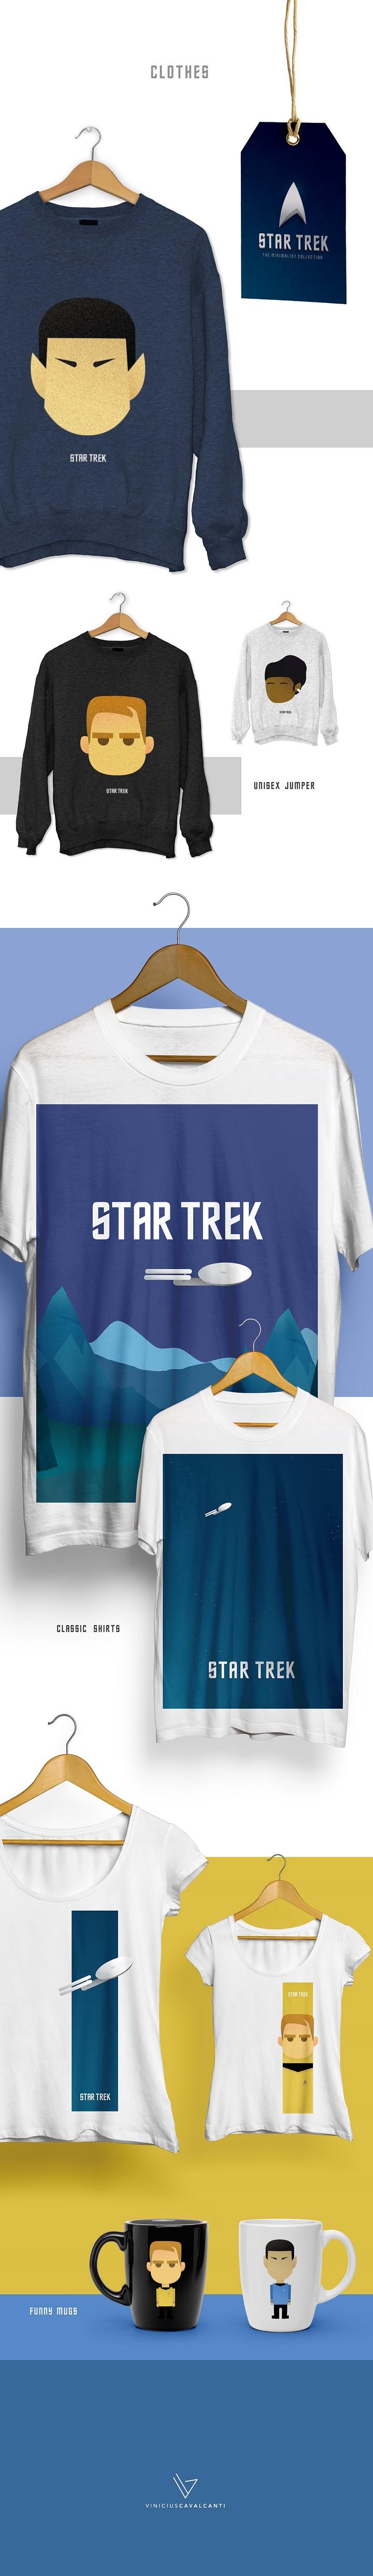 Star-Trek-minimalista